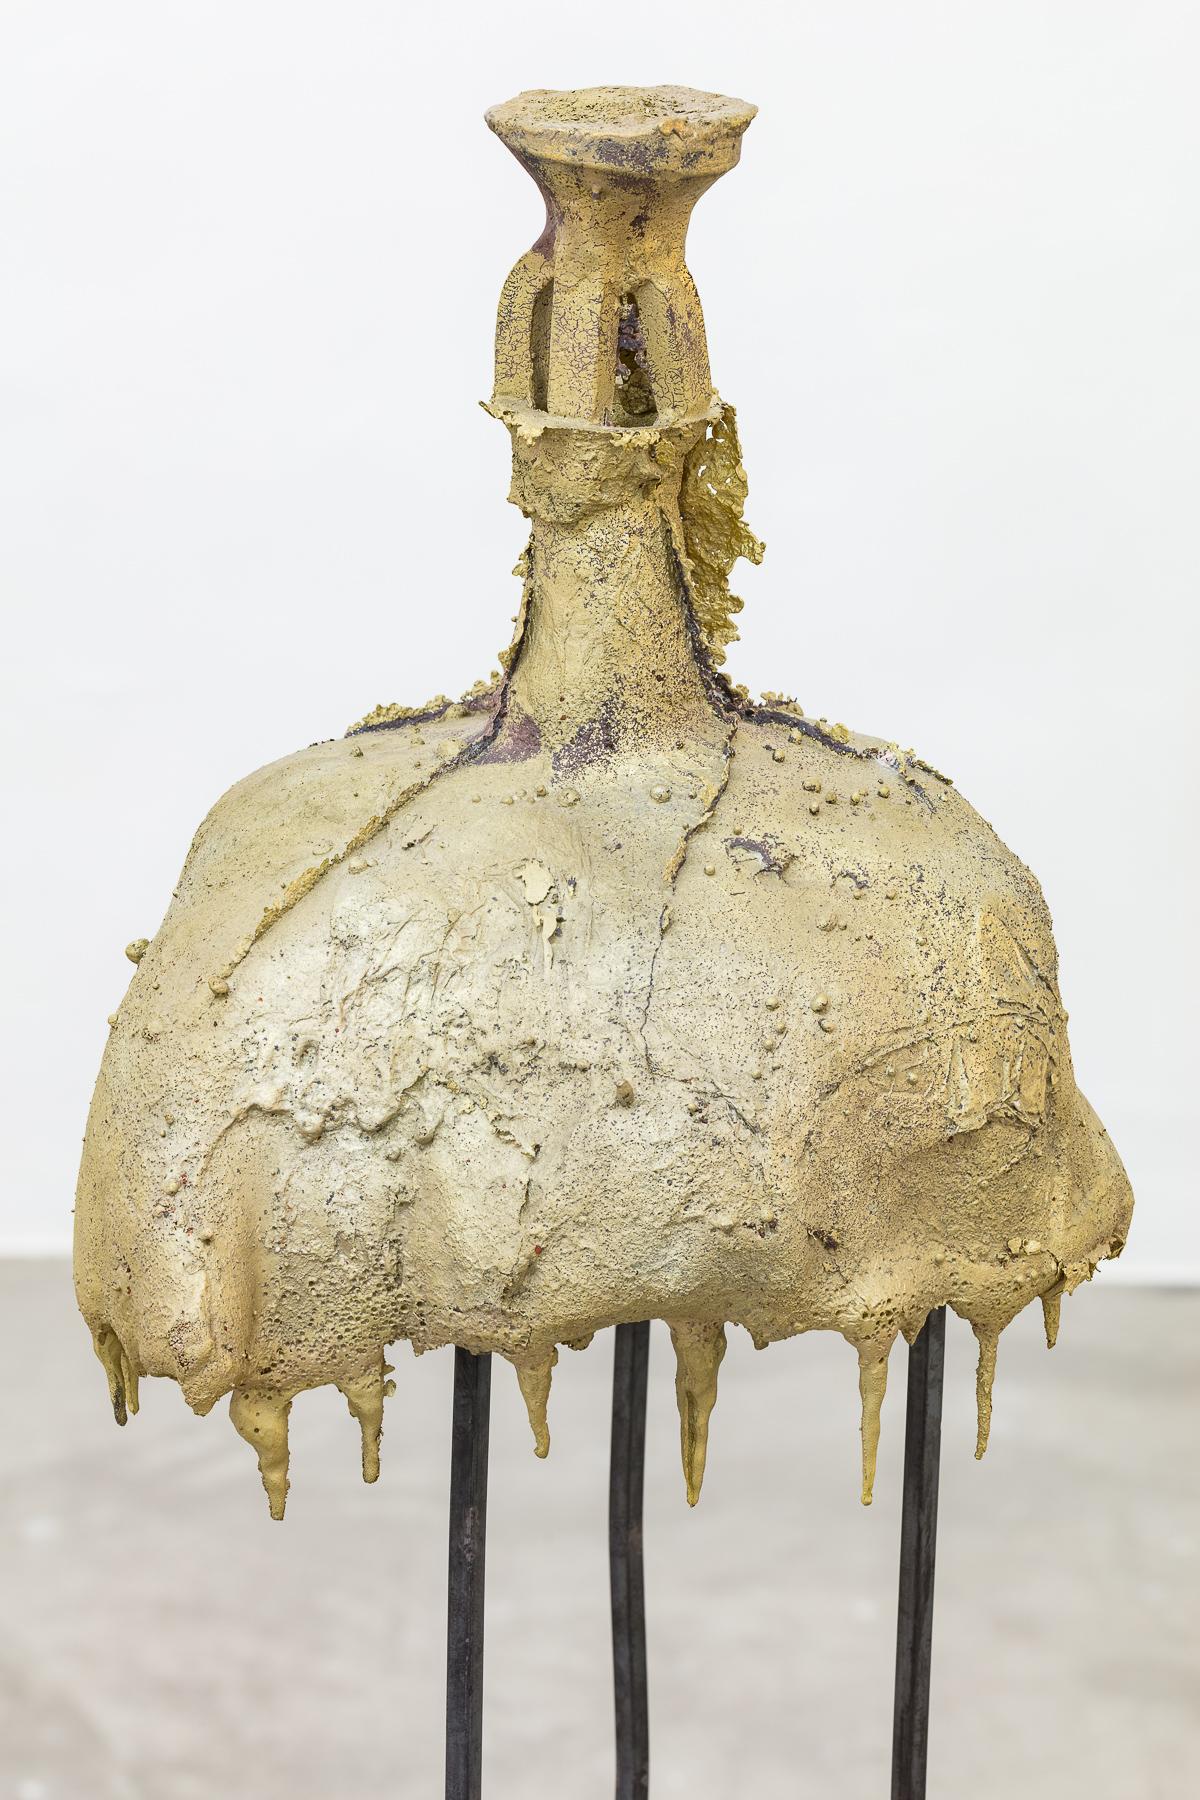 2019_02_19_Angelika Loderer_Kunstverein Graz_by_kunstdokumentationcom_020_web.jpg